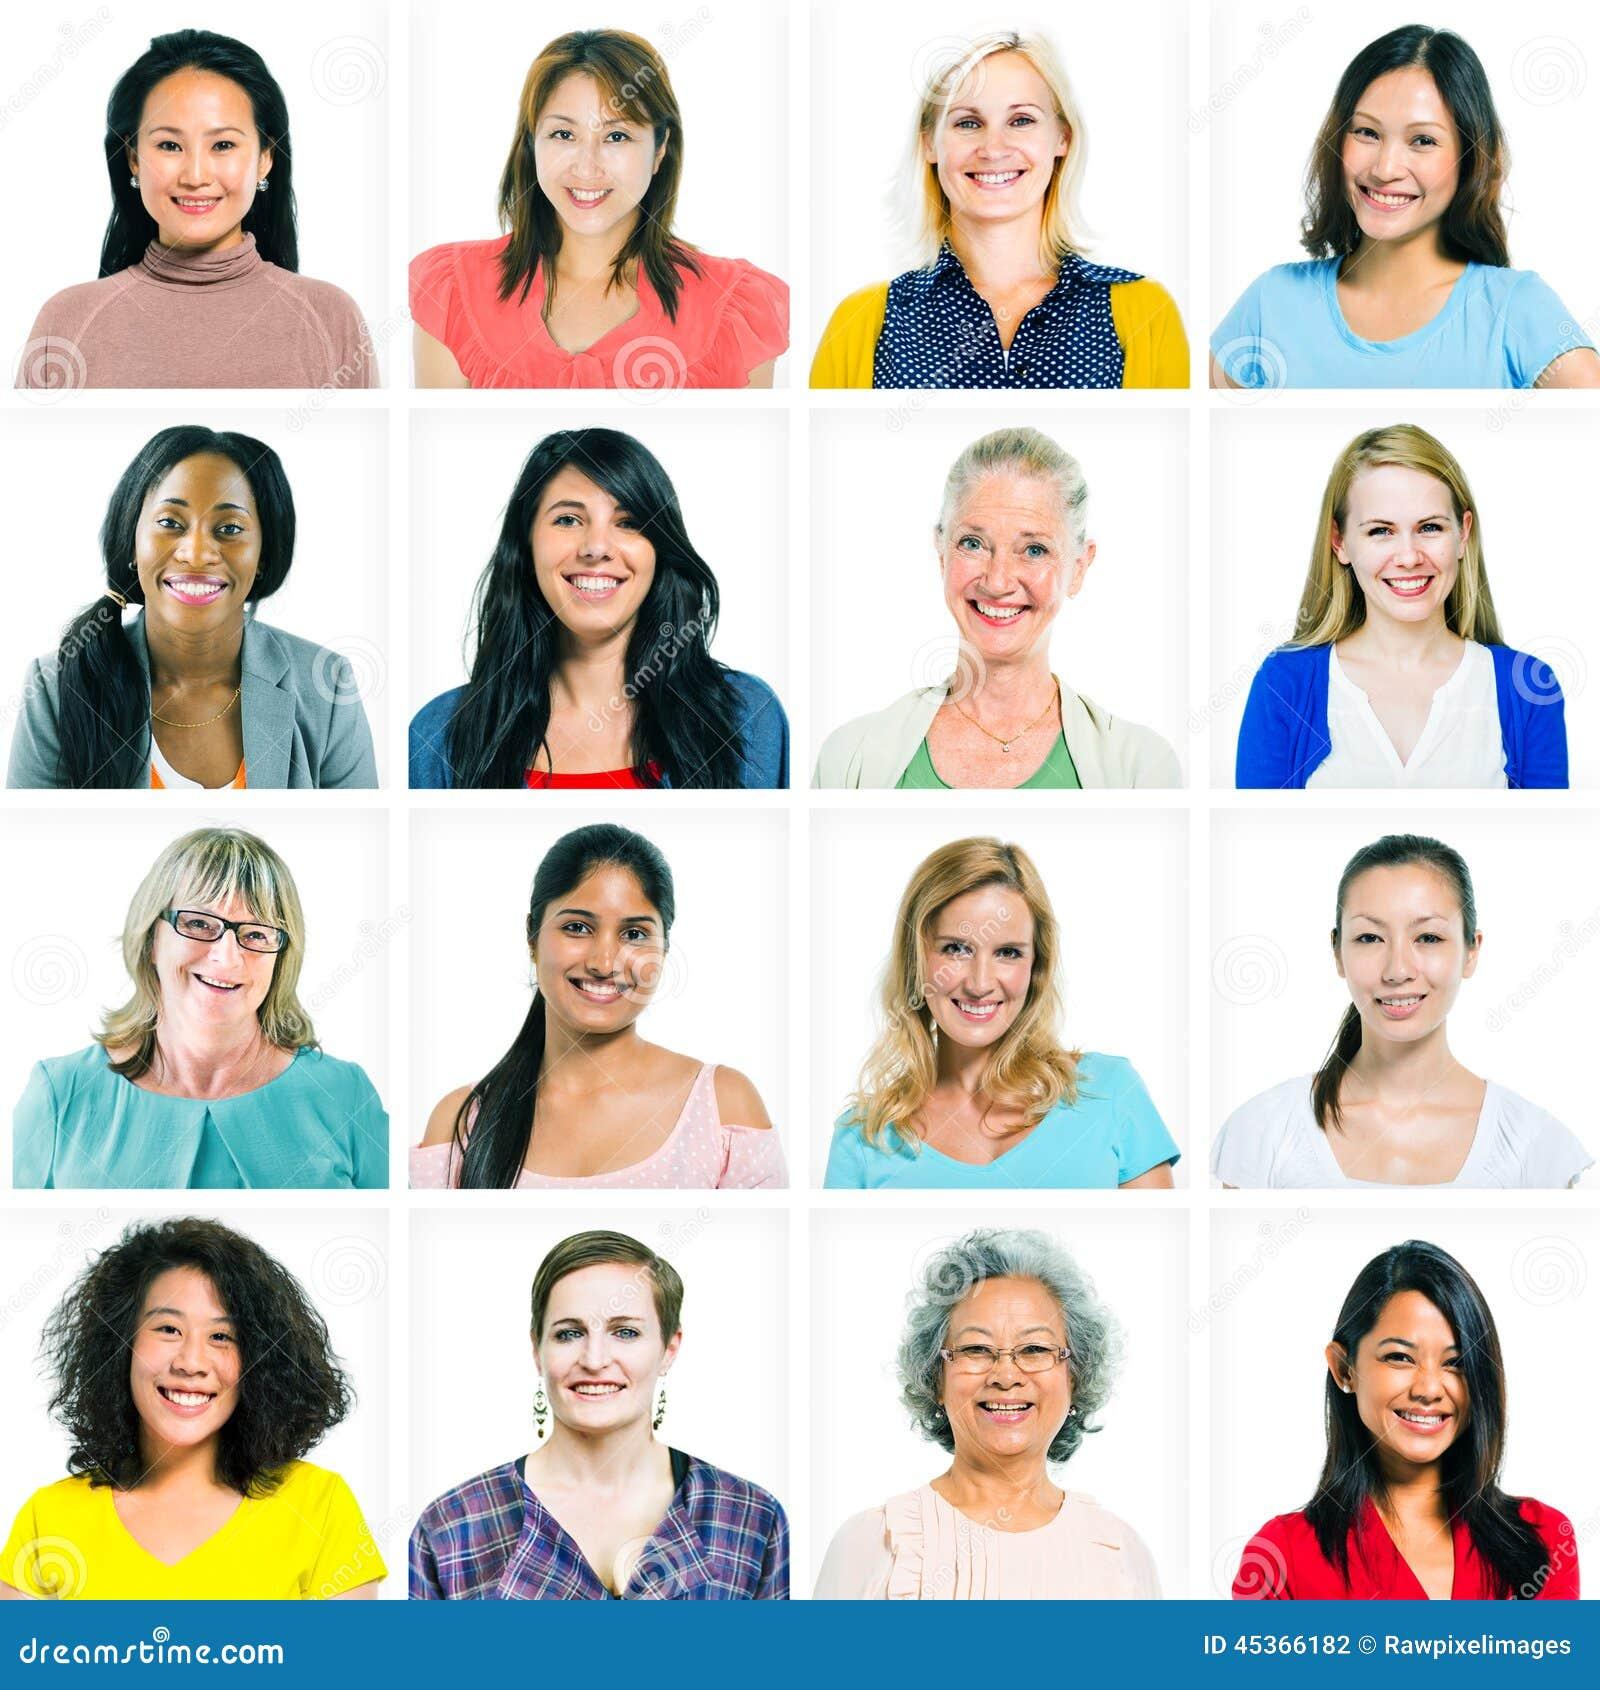 Retratos de mujeres diversas solamente